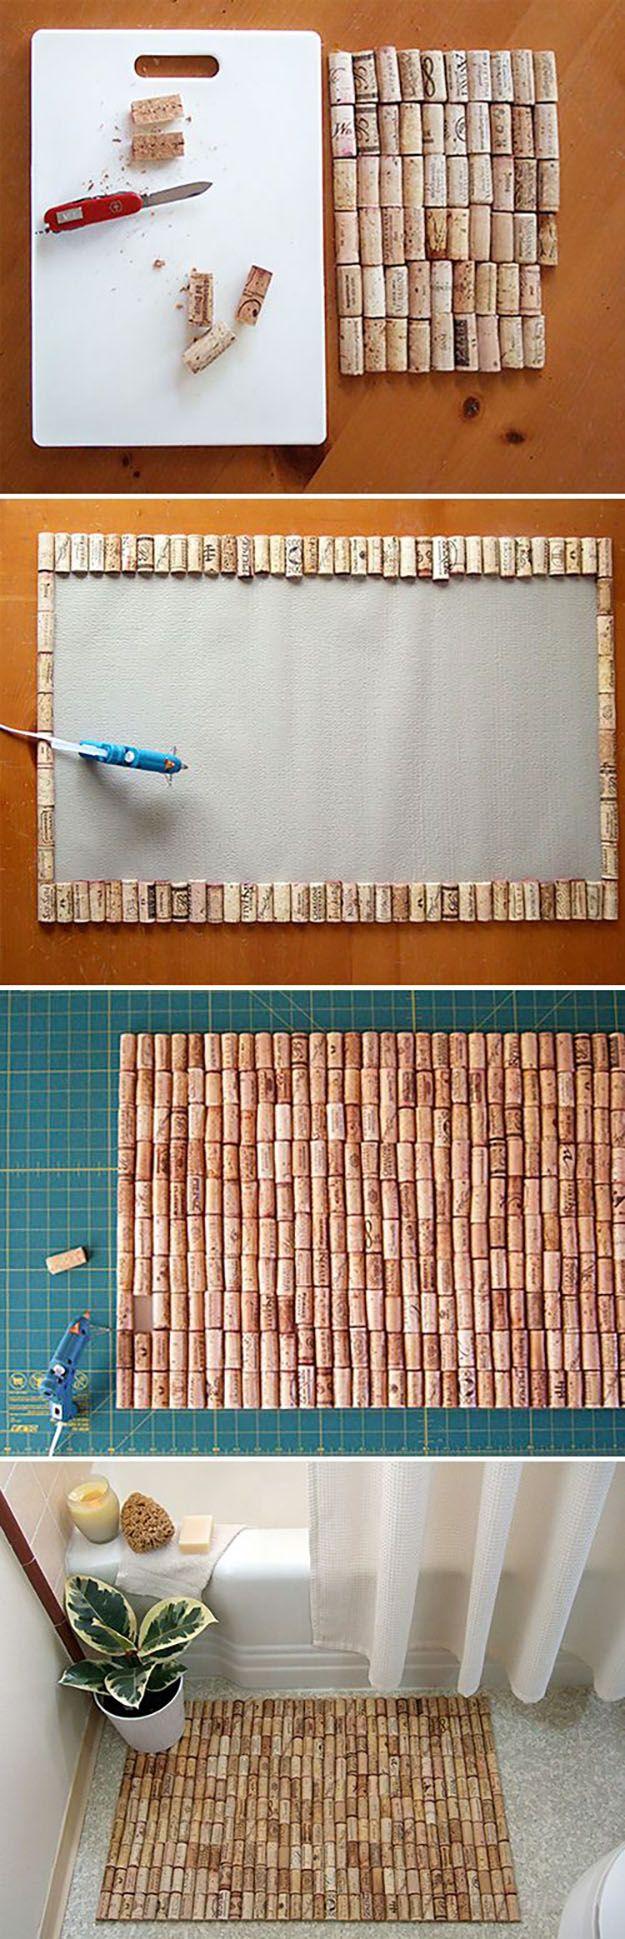 Easy Wine Cork Craft Ideas for the Home - DIY Wine Cork Bathmat - DIY Projects & Crafts by DIY JOY